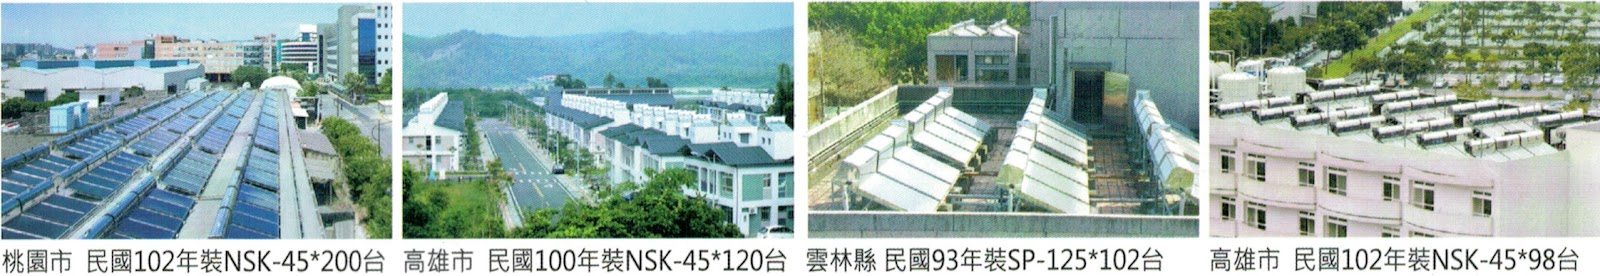 =39DM常態版60-04#正3-3(4).jpg